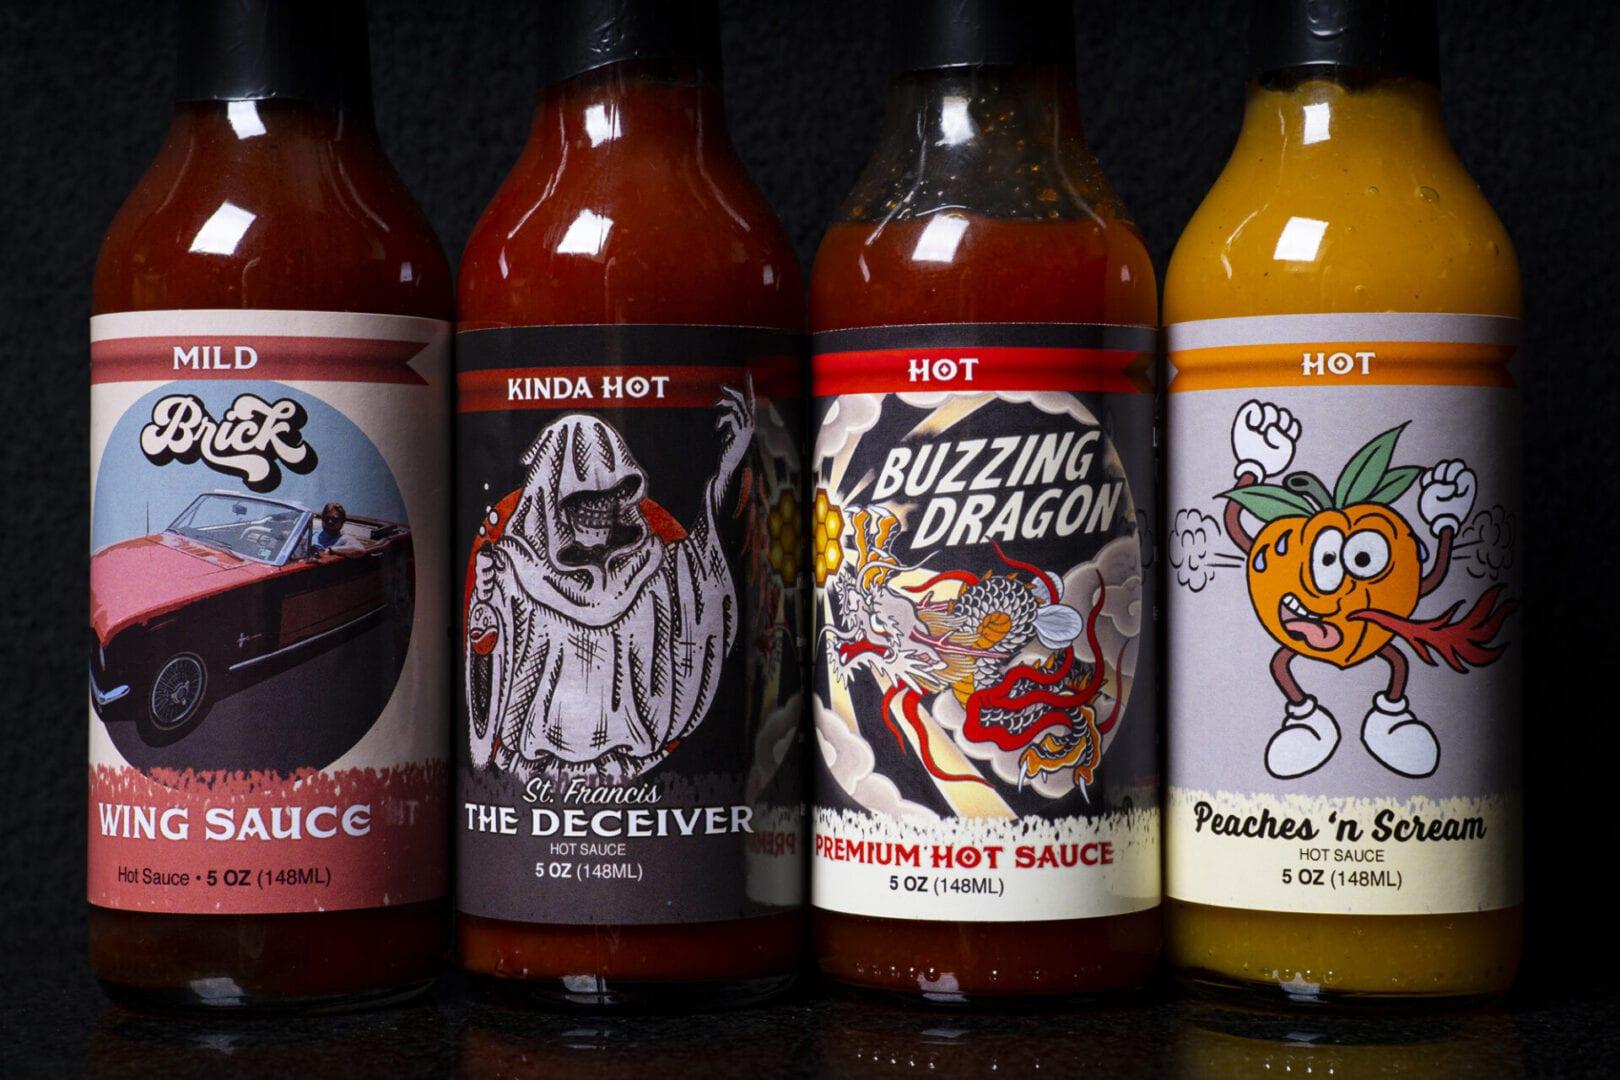 Ledwon's Hot Sauce 4-packl